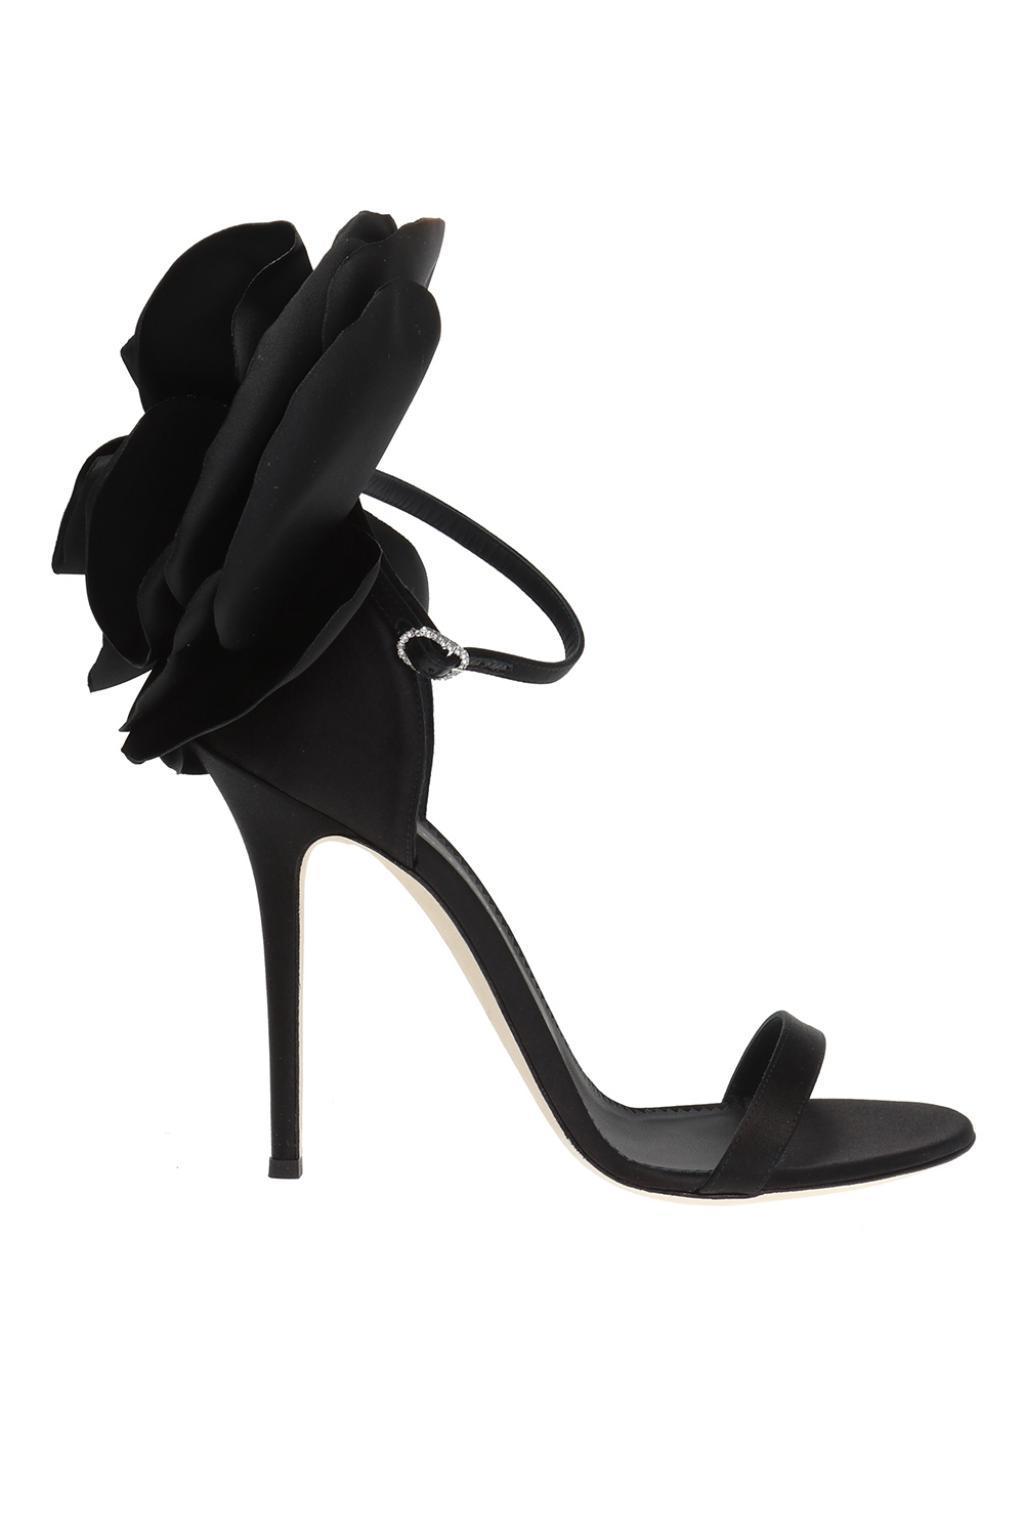 84bcf643222 Lyst - Giuseppe Zanotti  alien  Heeled Sandals in Black